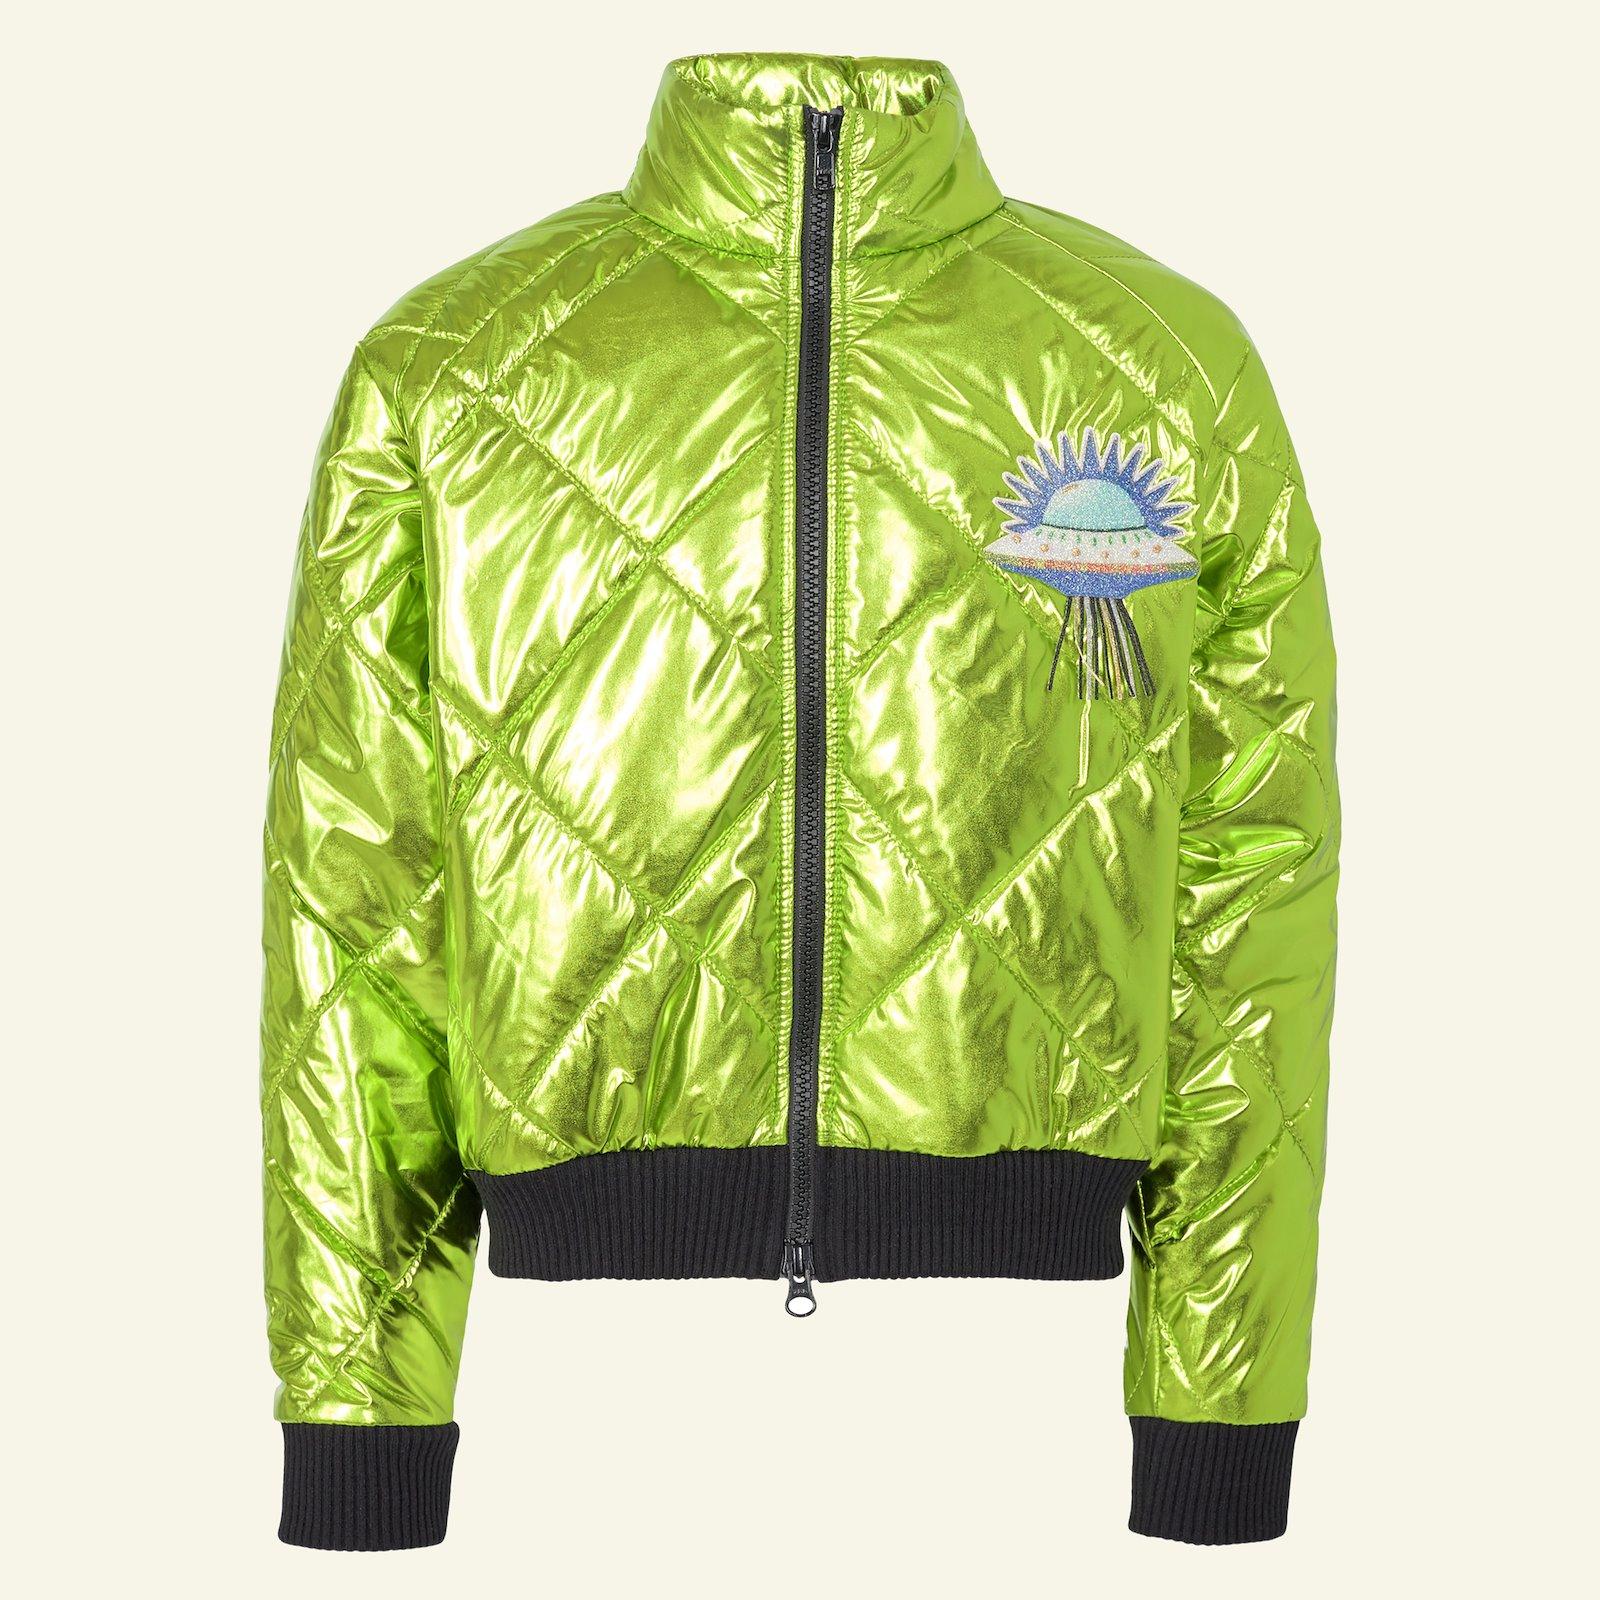 Anorak and jacket, 140/10y p64020_920221_96077_26464_sskit